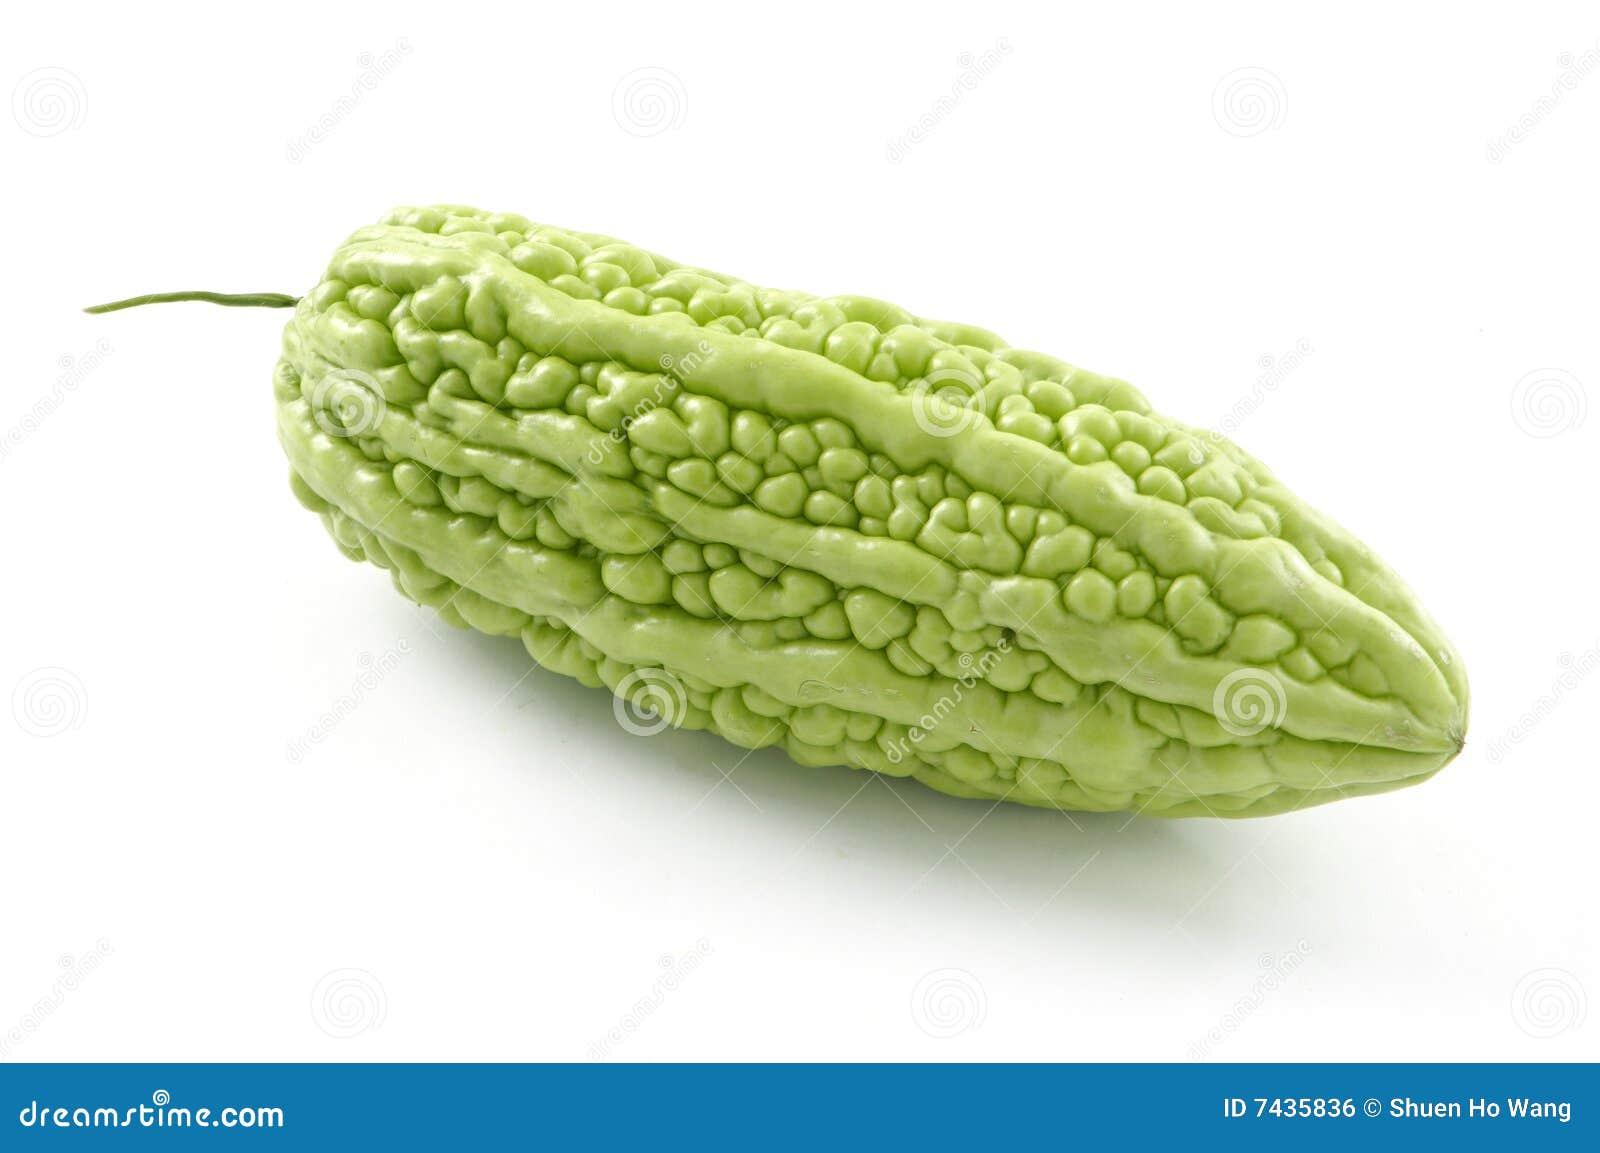 Ampalaya stock photography 46168520 - Bitter melon culture ...